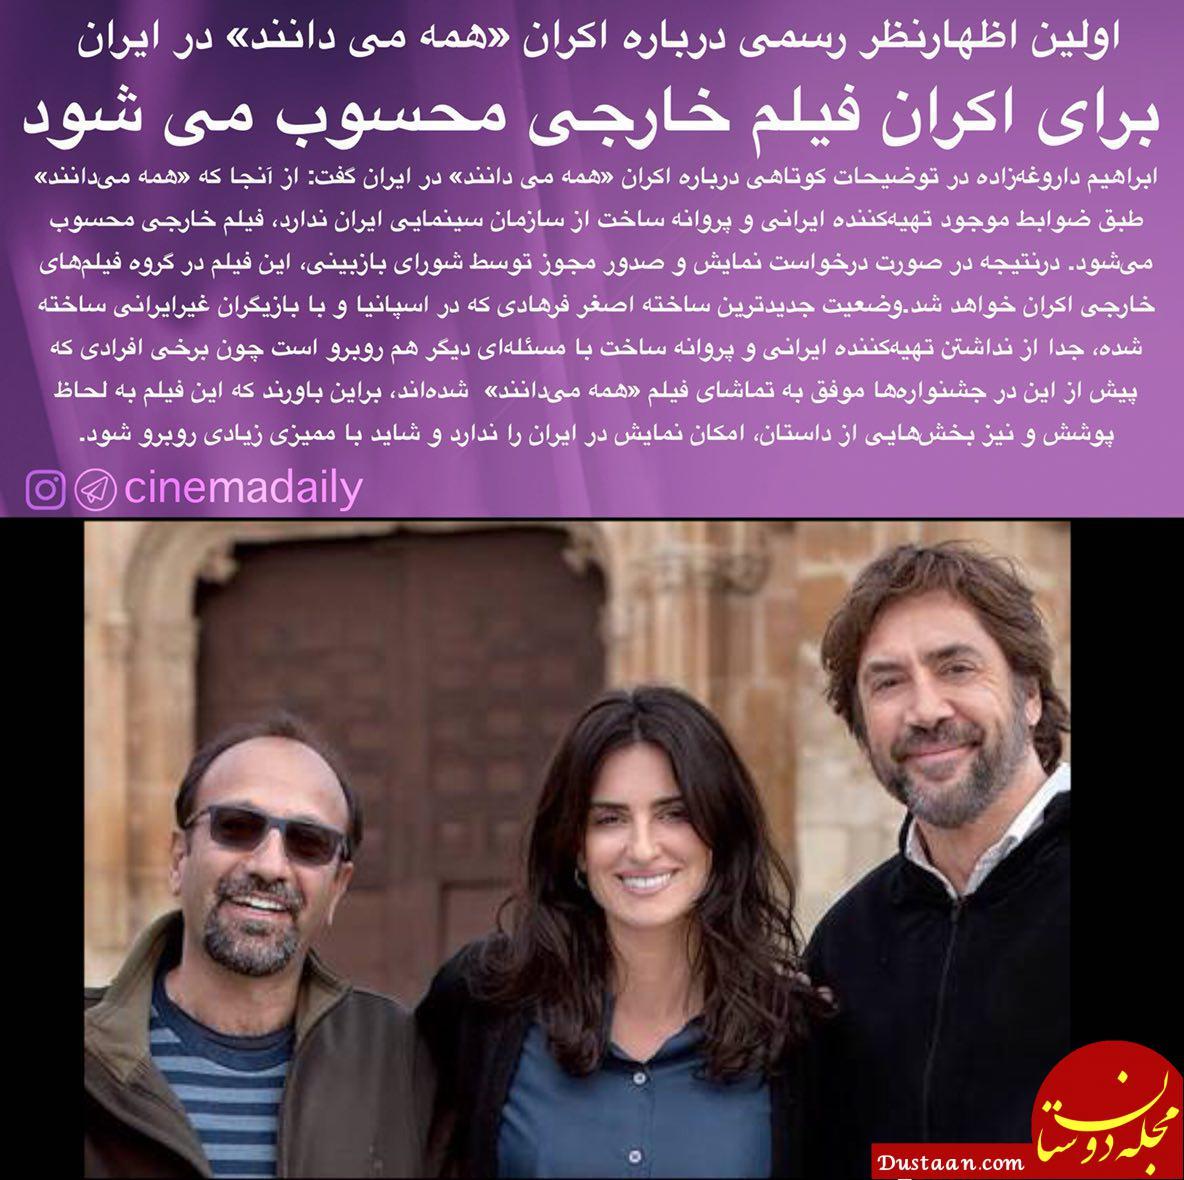 www.dustaan.com «همه می دانند» برای اکران، فیلم خارجی محسوب می شود